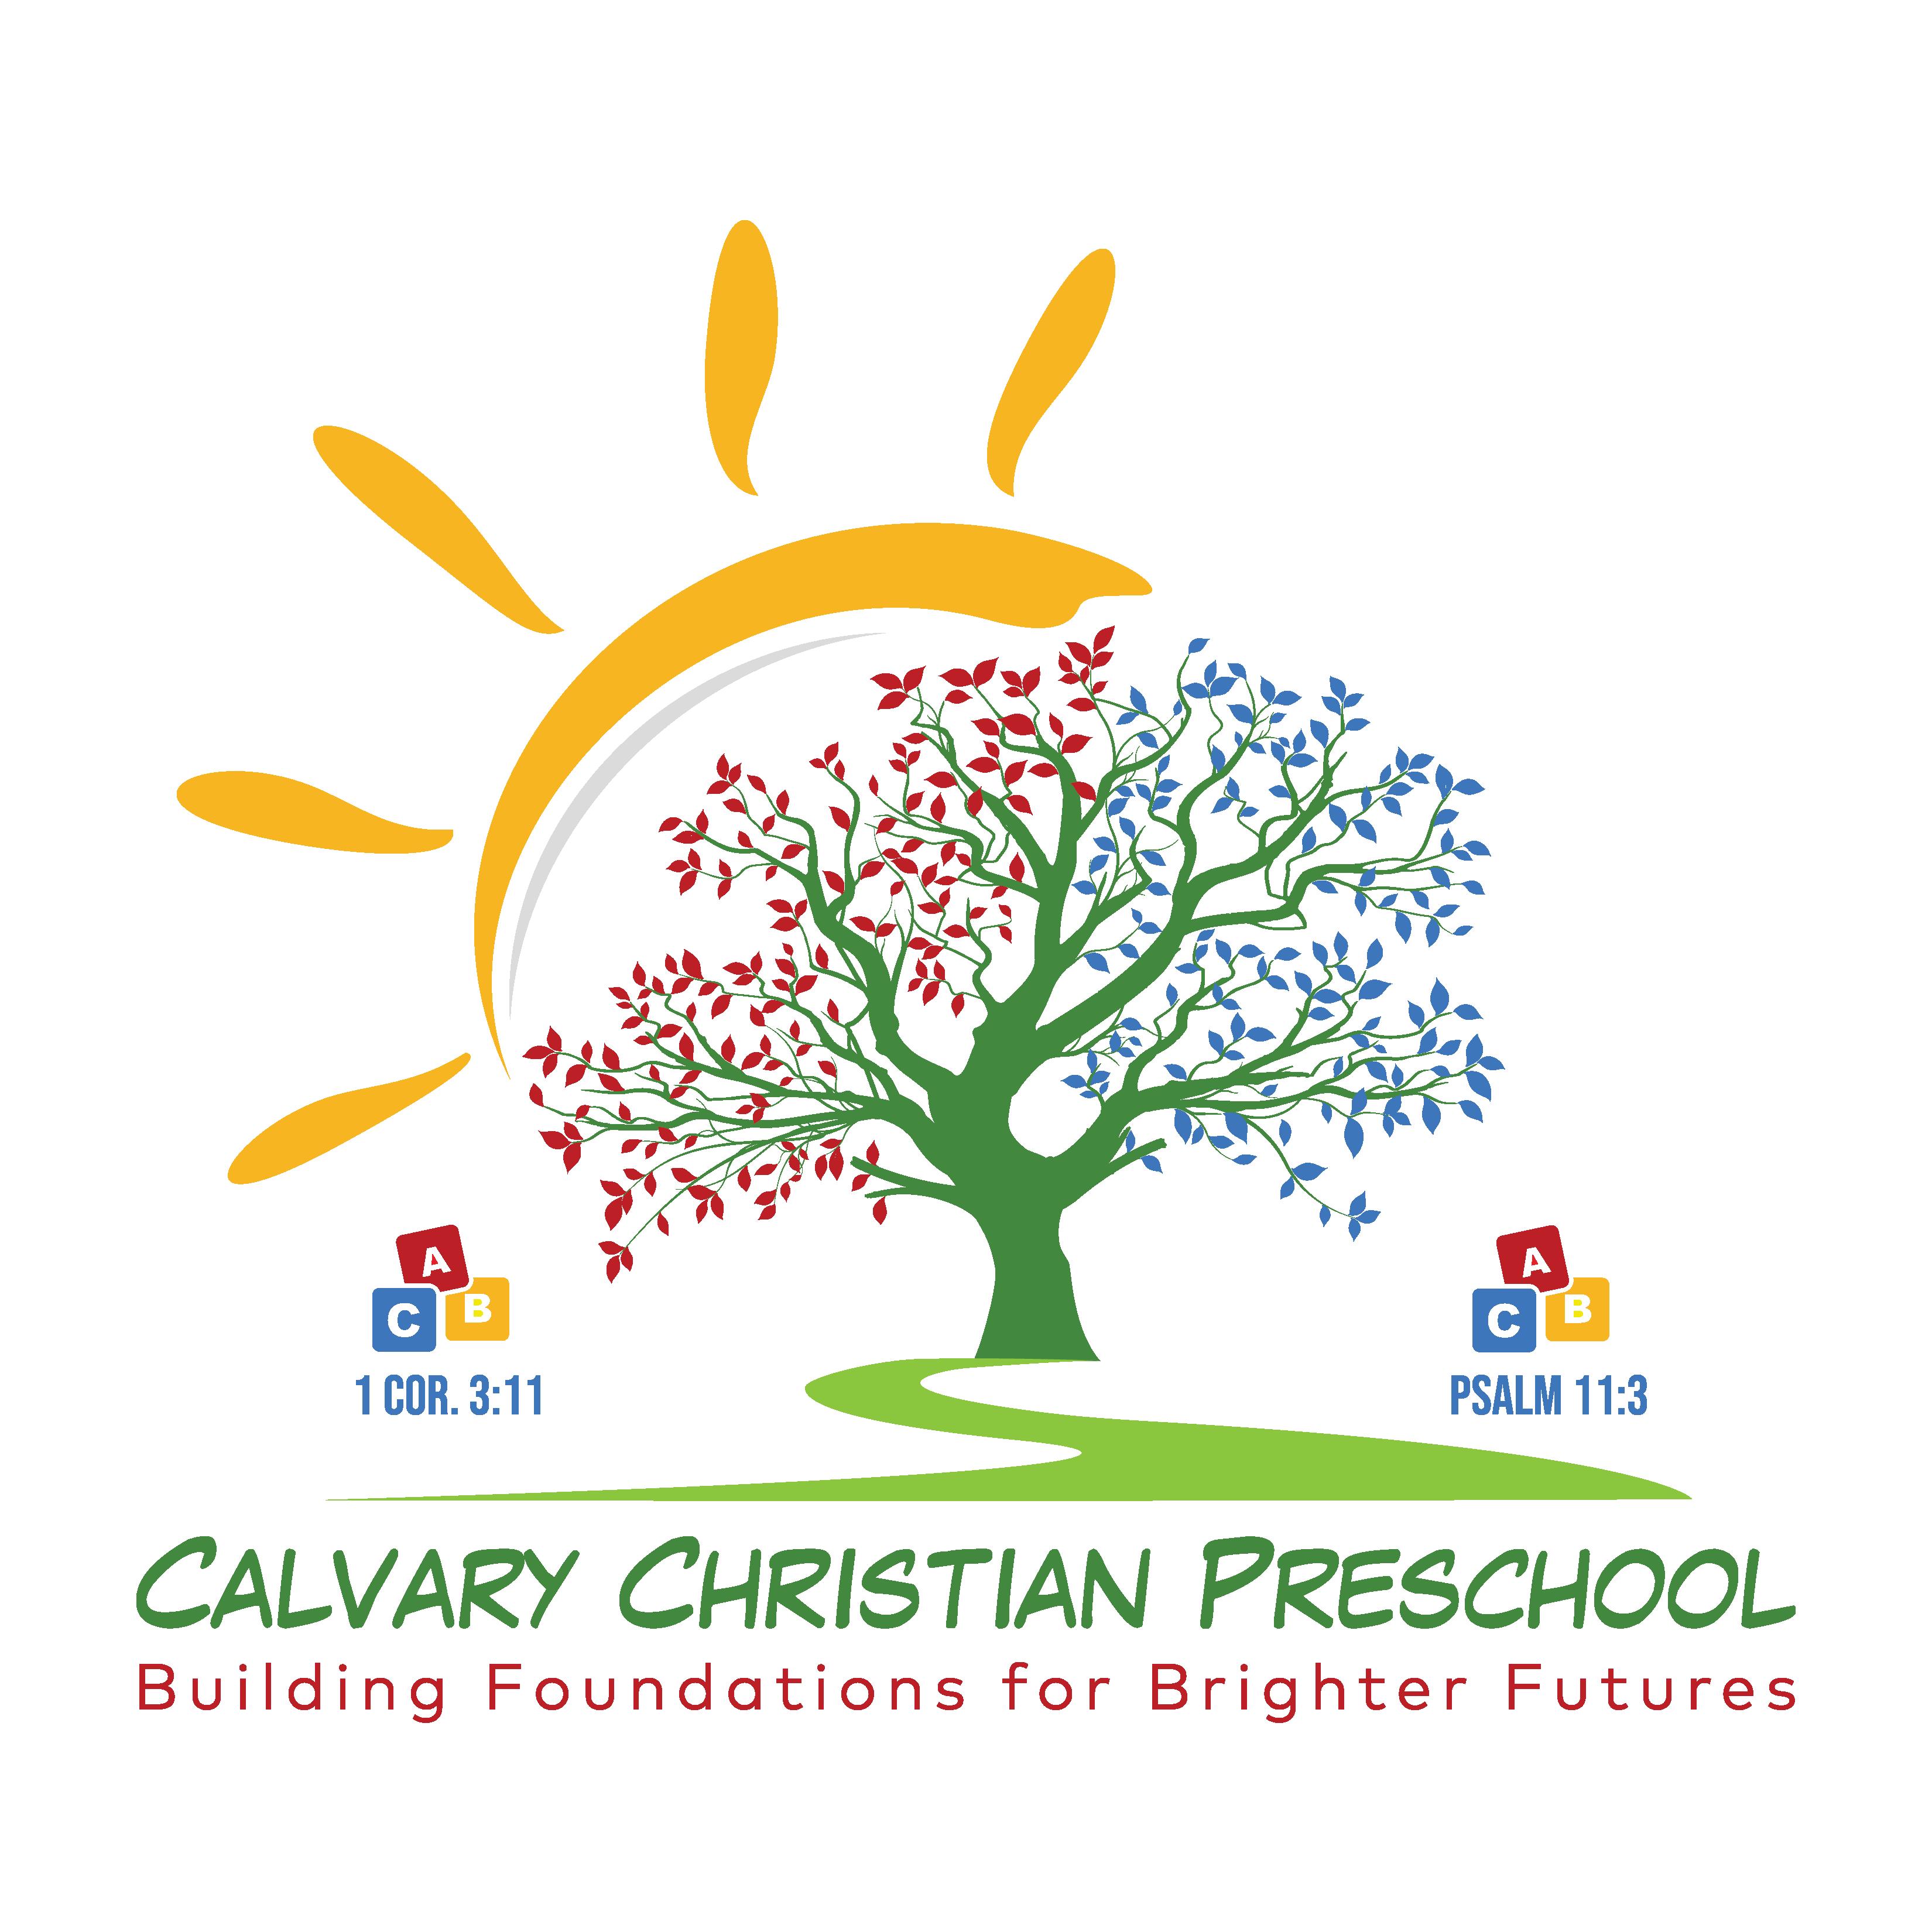 Calvary Christian Preschool